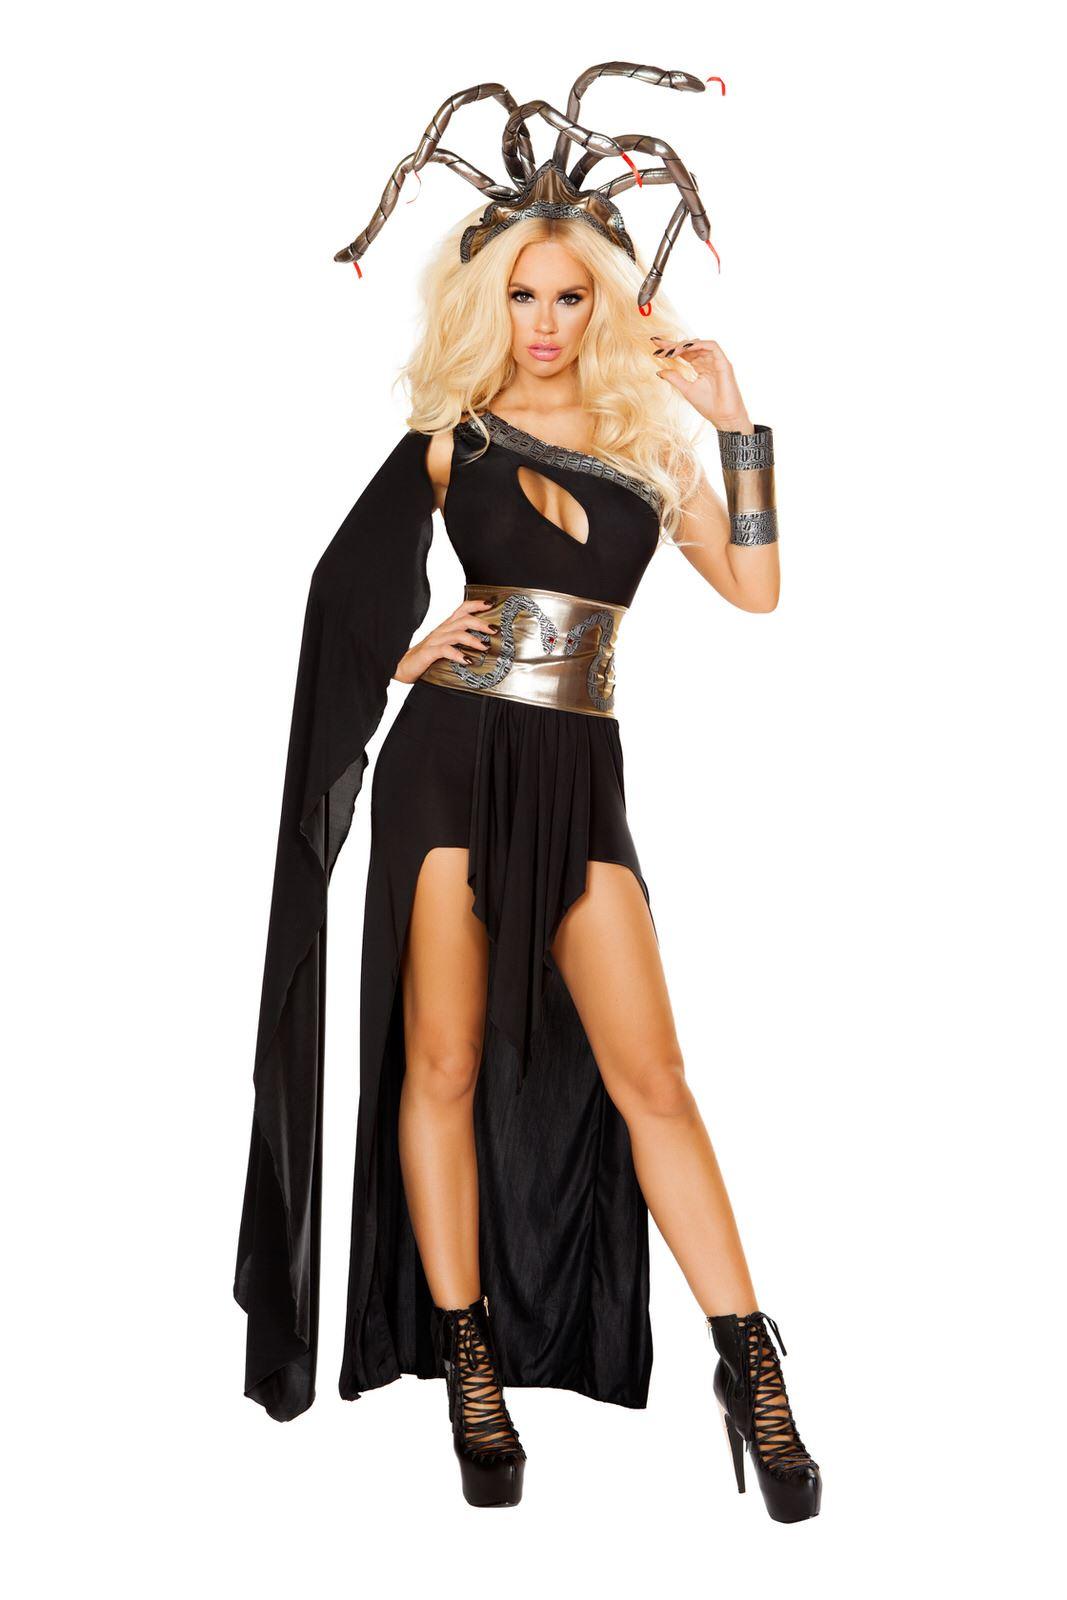 adult medusa woman costume snake princess | $85.99 | the costume land